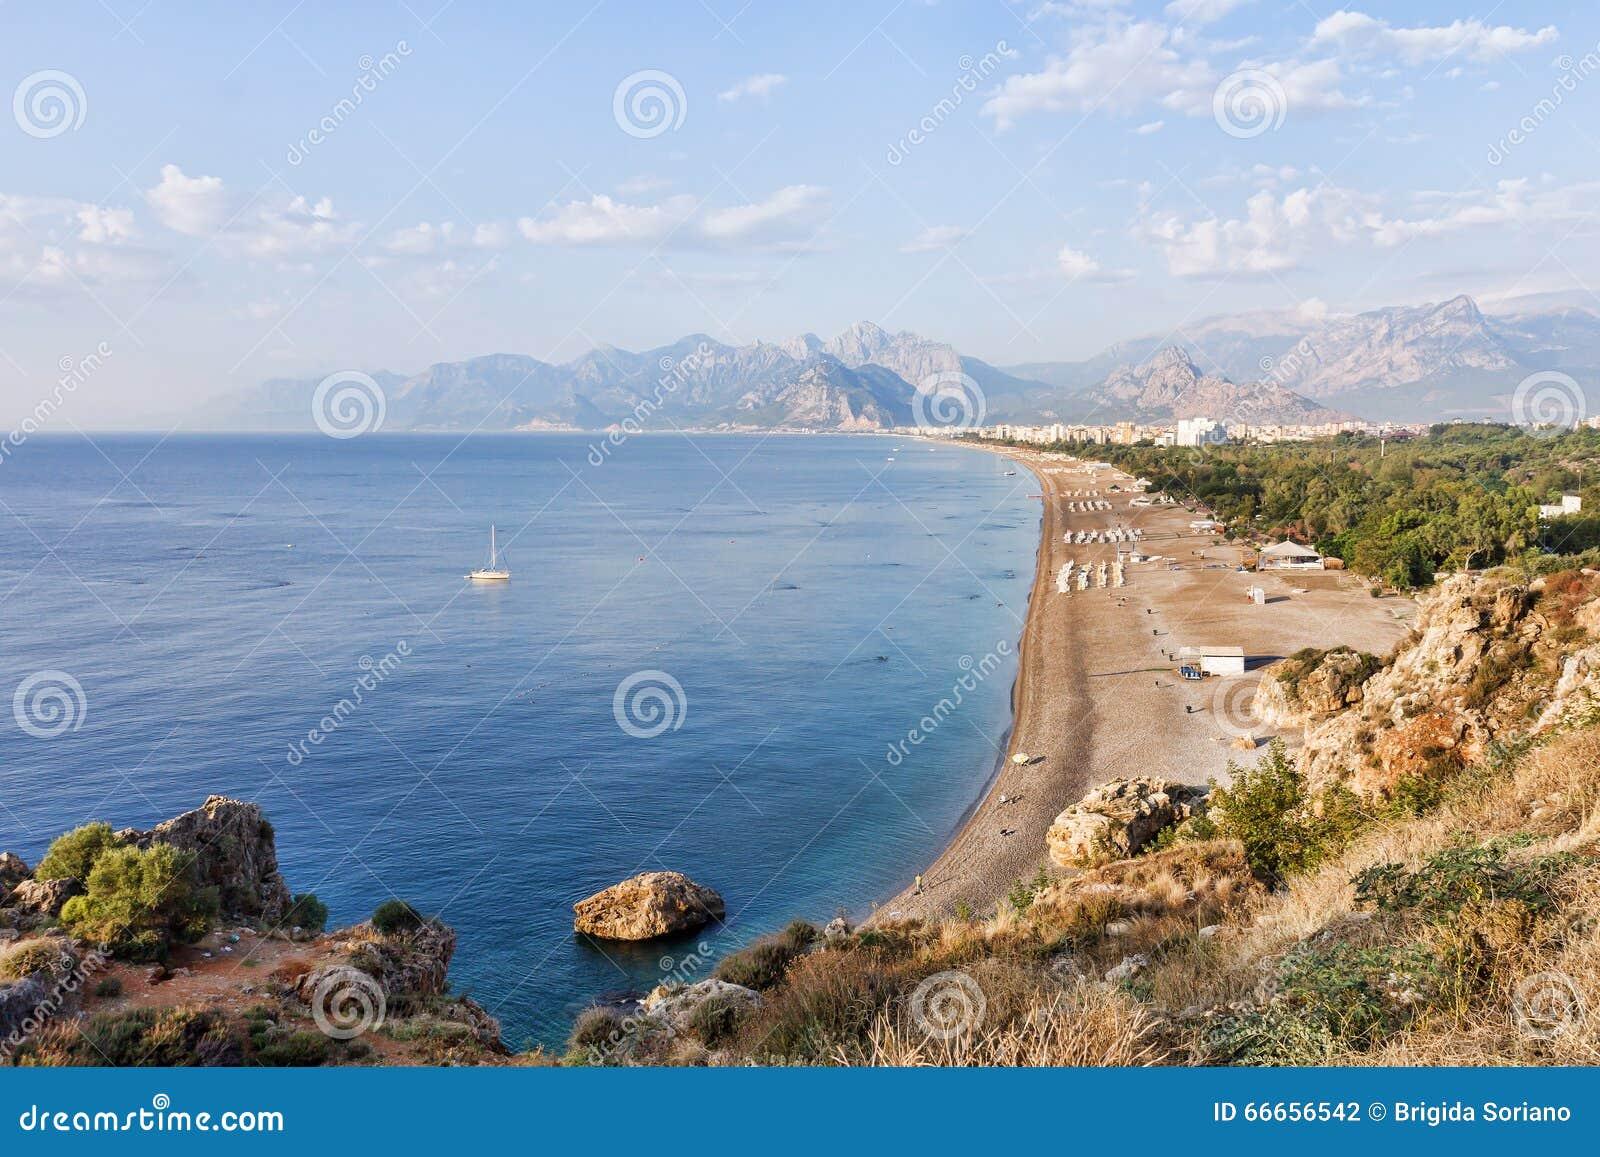 Asia Beach Resort Antalya Coast